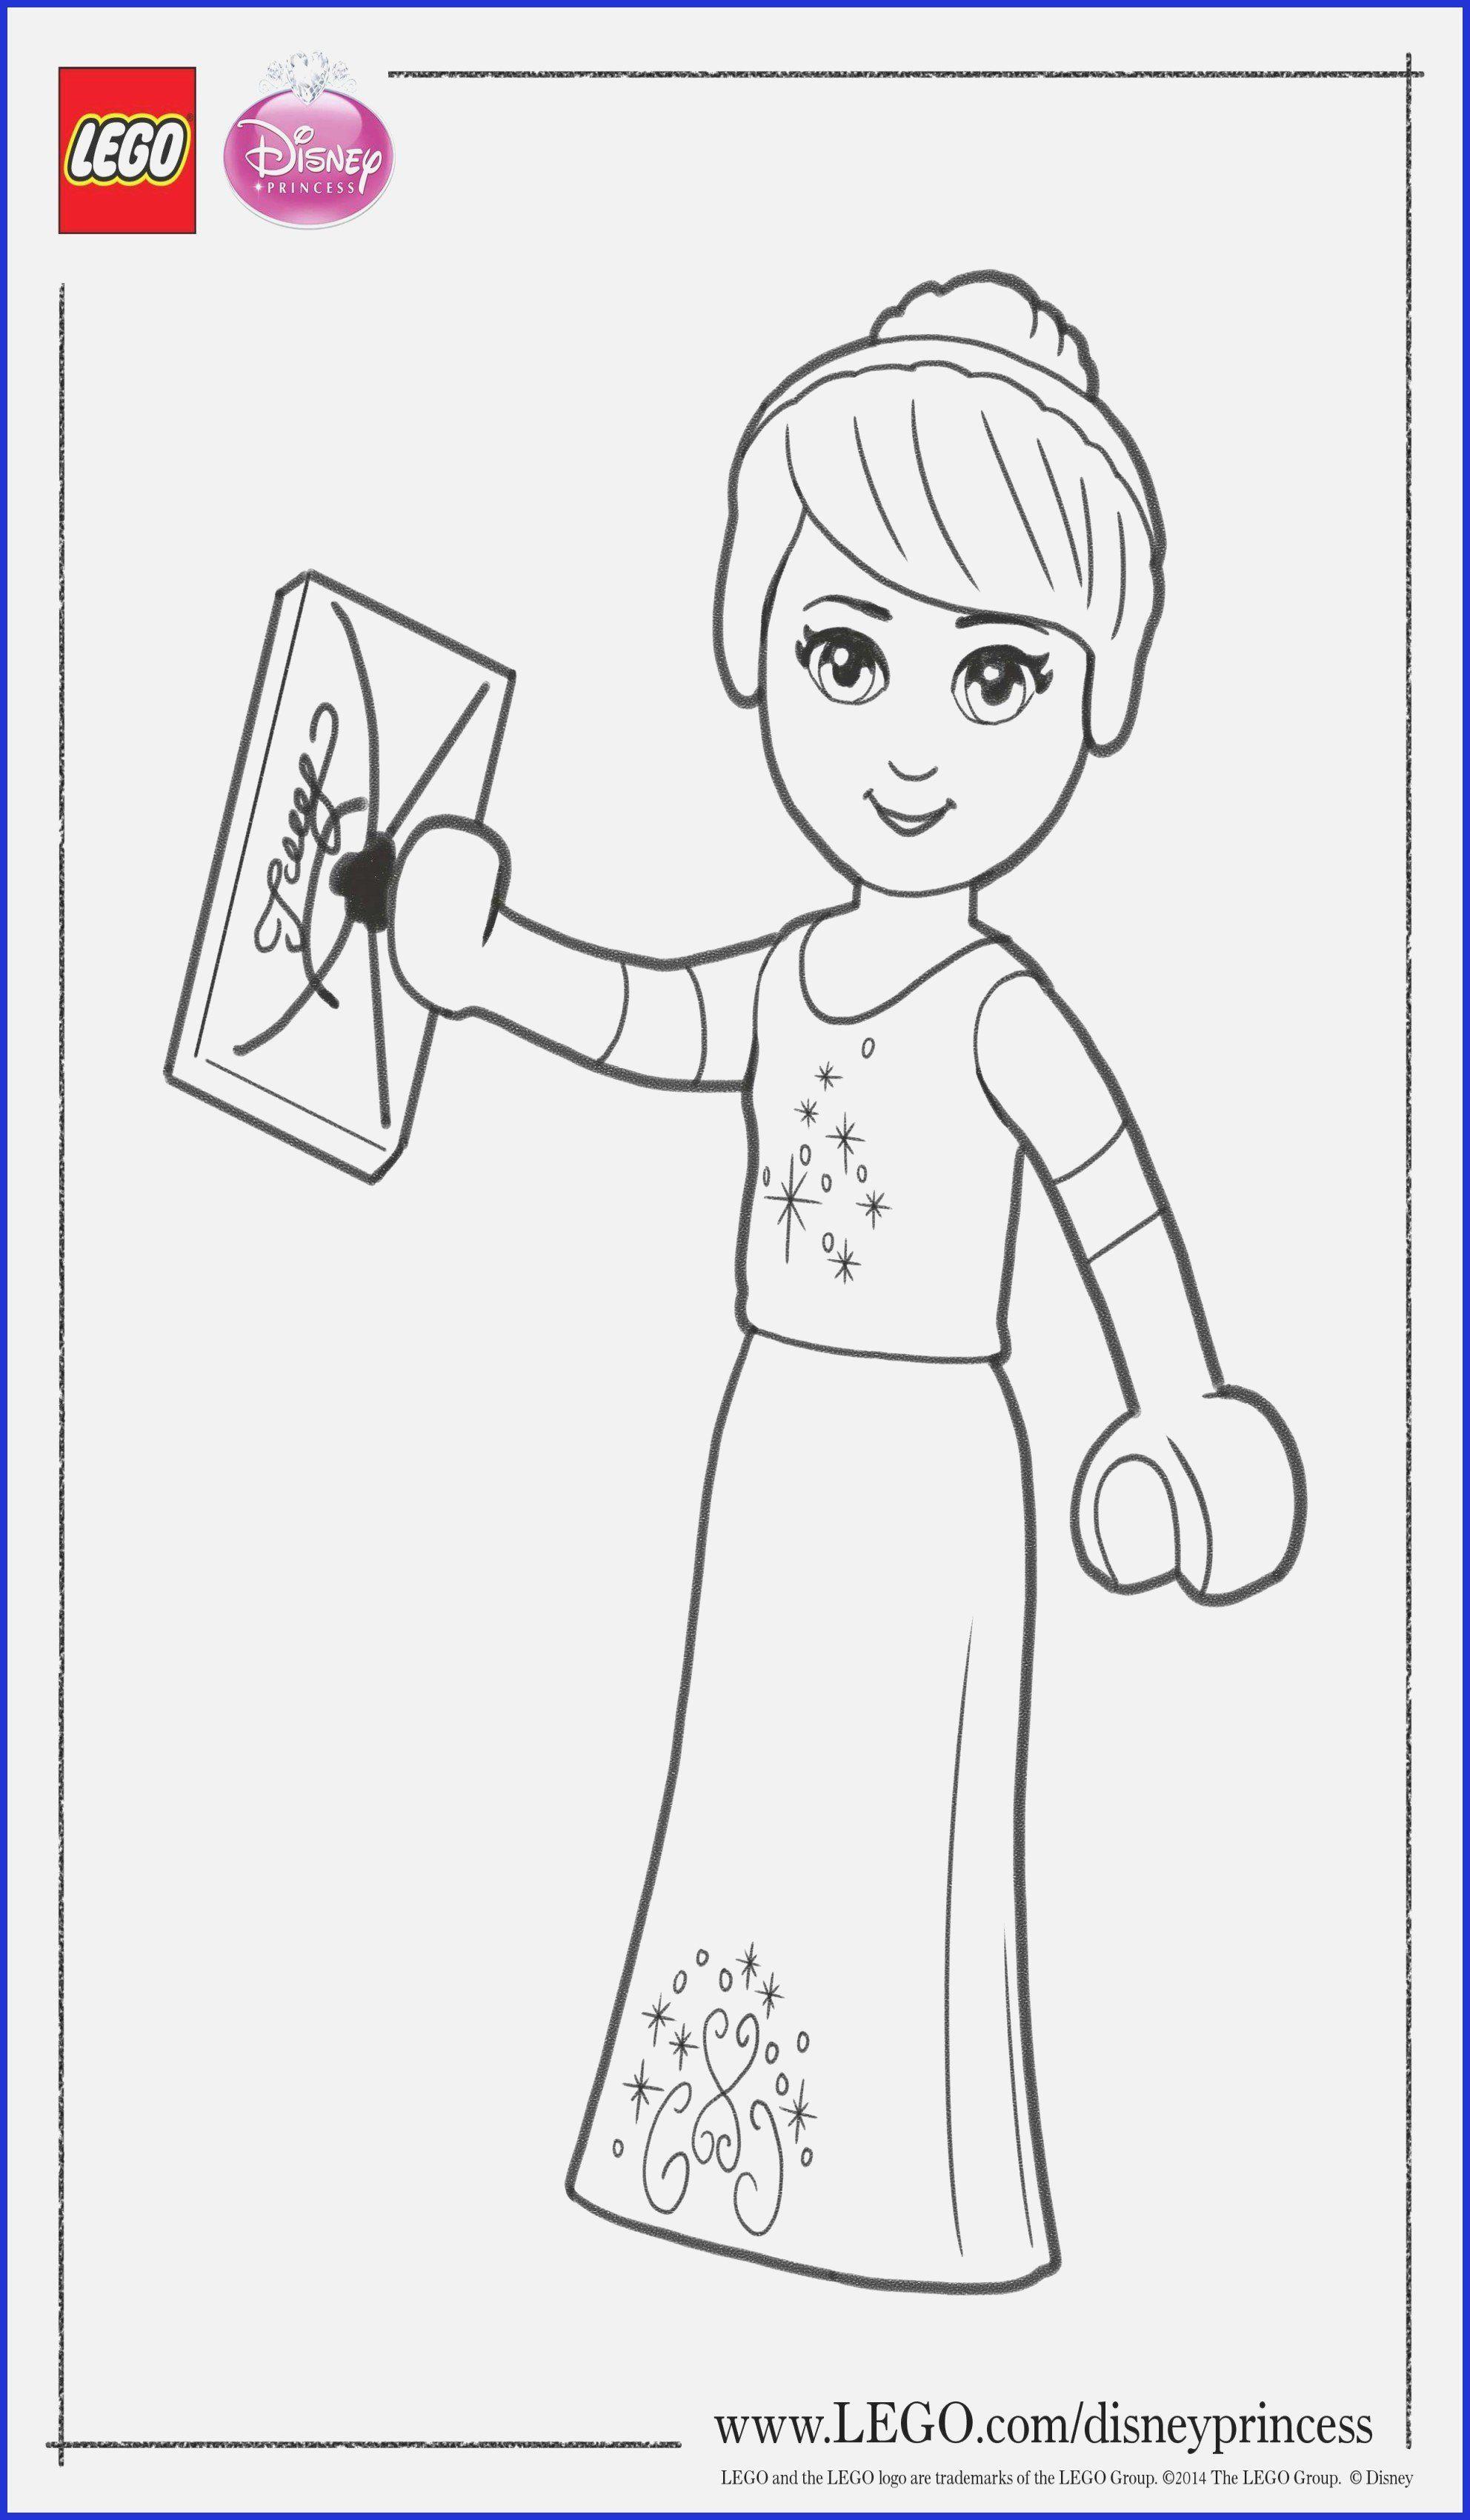 Disney Princess Coloring Book Beautiful Disney Princess Coloring Pages Free To P In 2020 Disney Princess Coloring Pages Disney Princess Colors Toy Story Coloring Pages